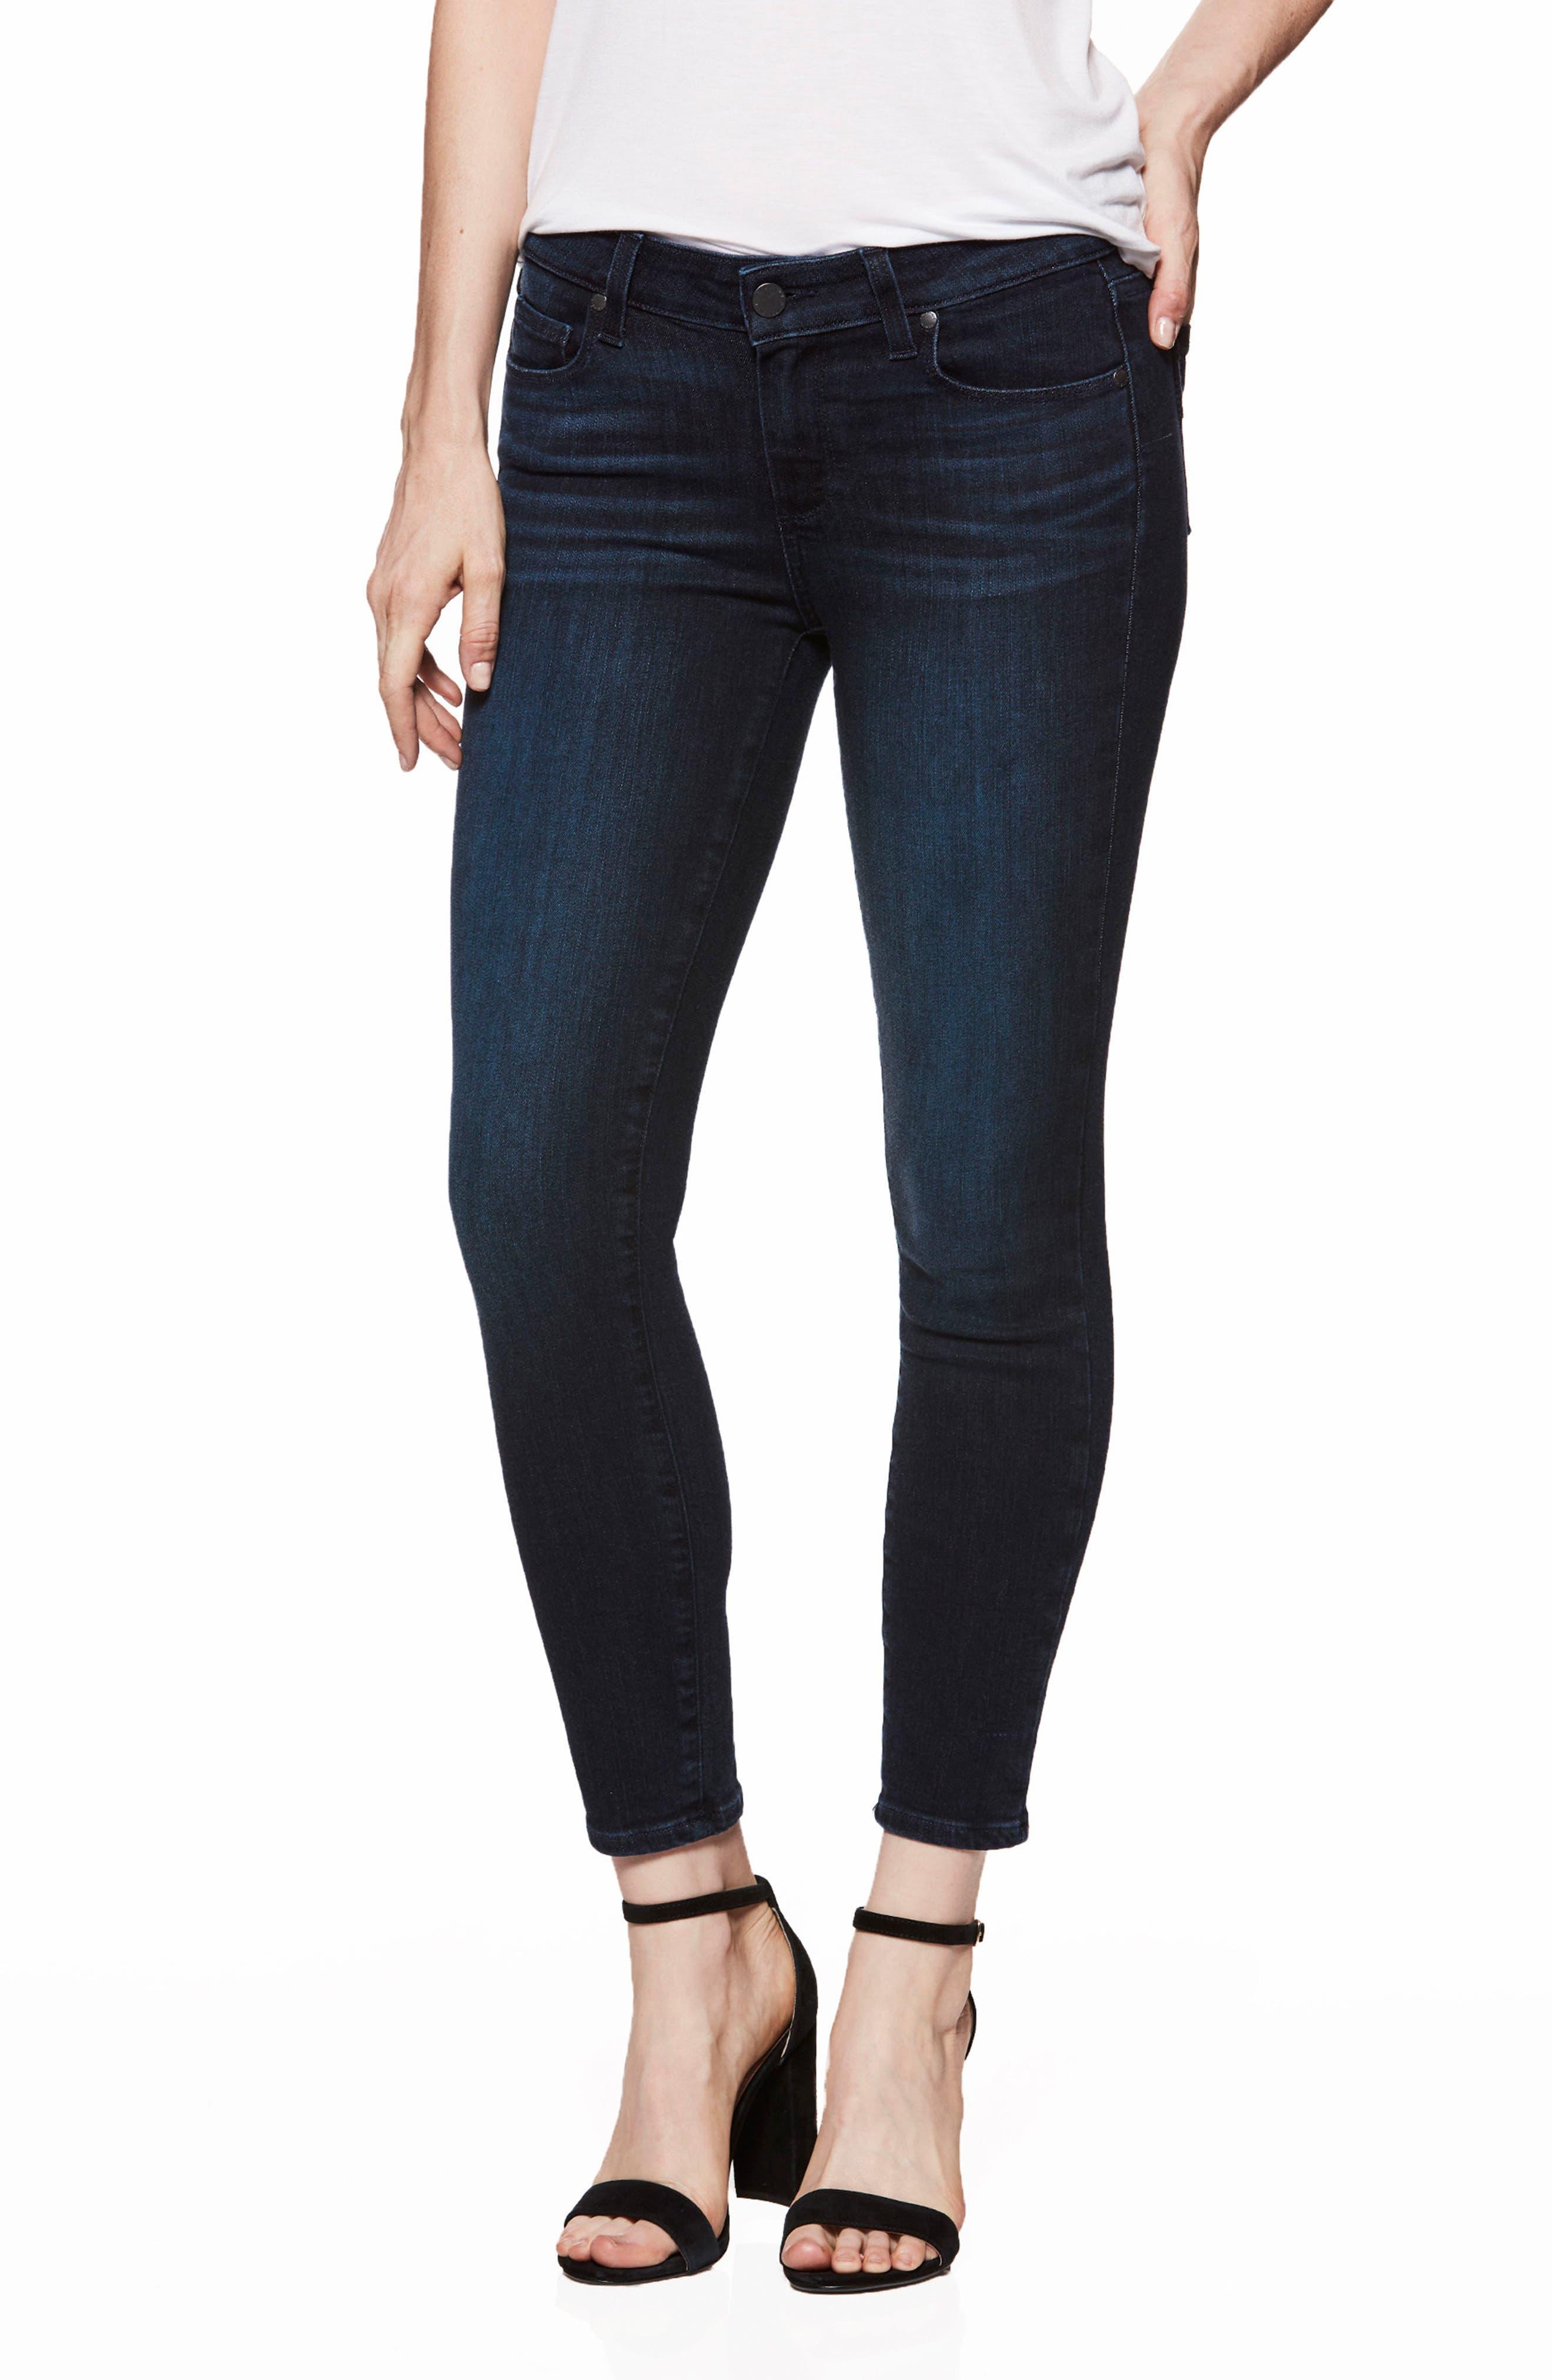 Transcend Vintage - Verdugo Crop Ultra Skinny Jeans,                             Main thumbnail 1, color,                             Luella